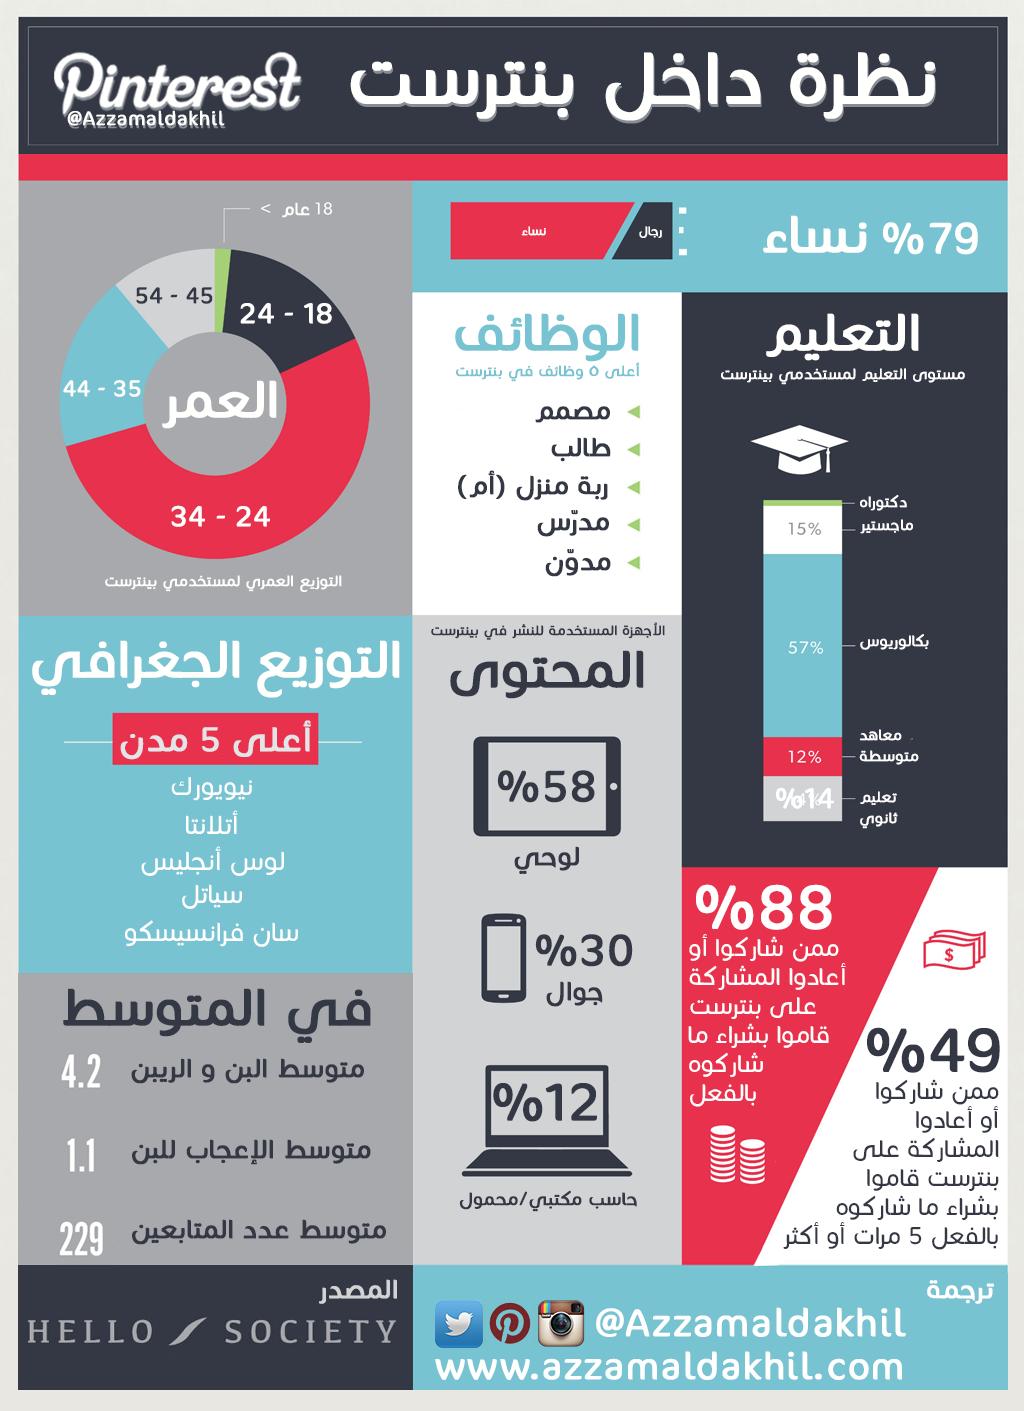 نظرة داخل بنترست Learning Websites Infographic Marketing Learning Apps